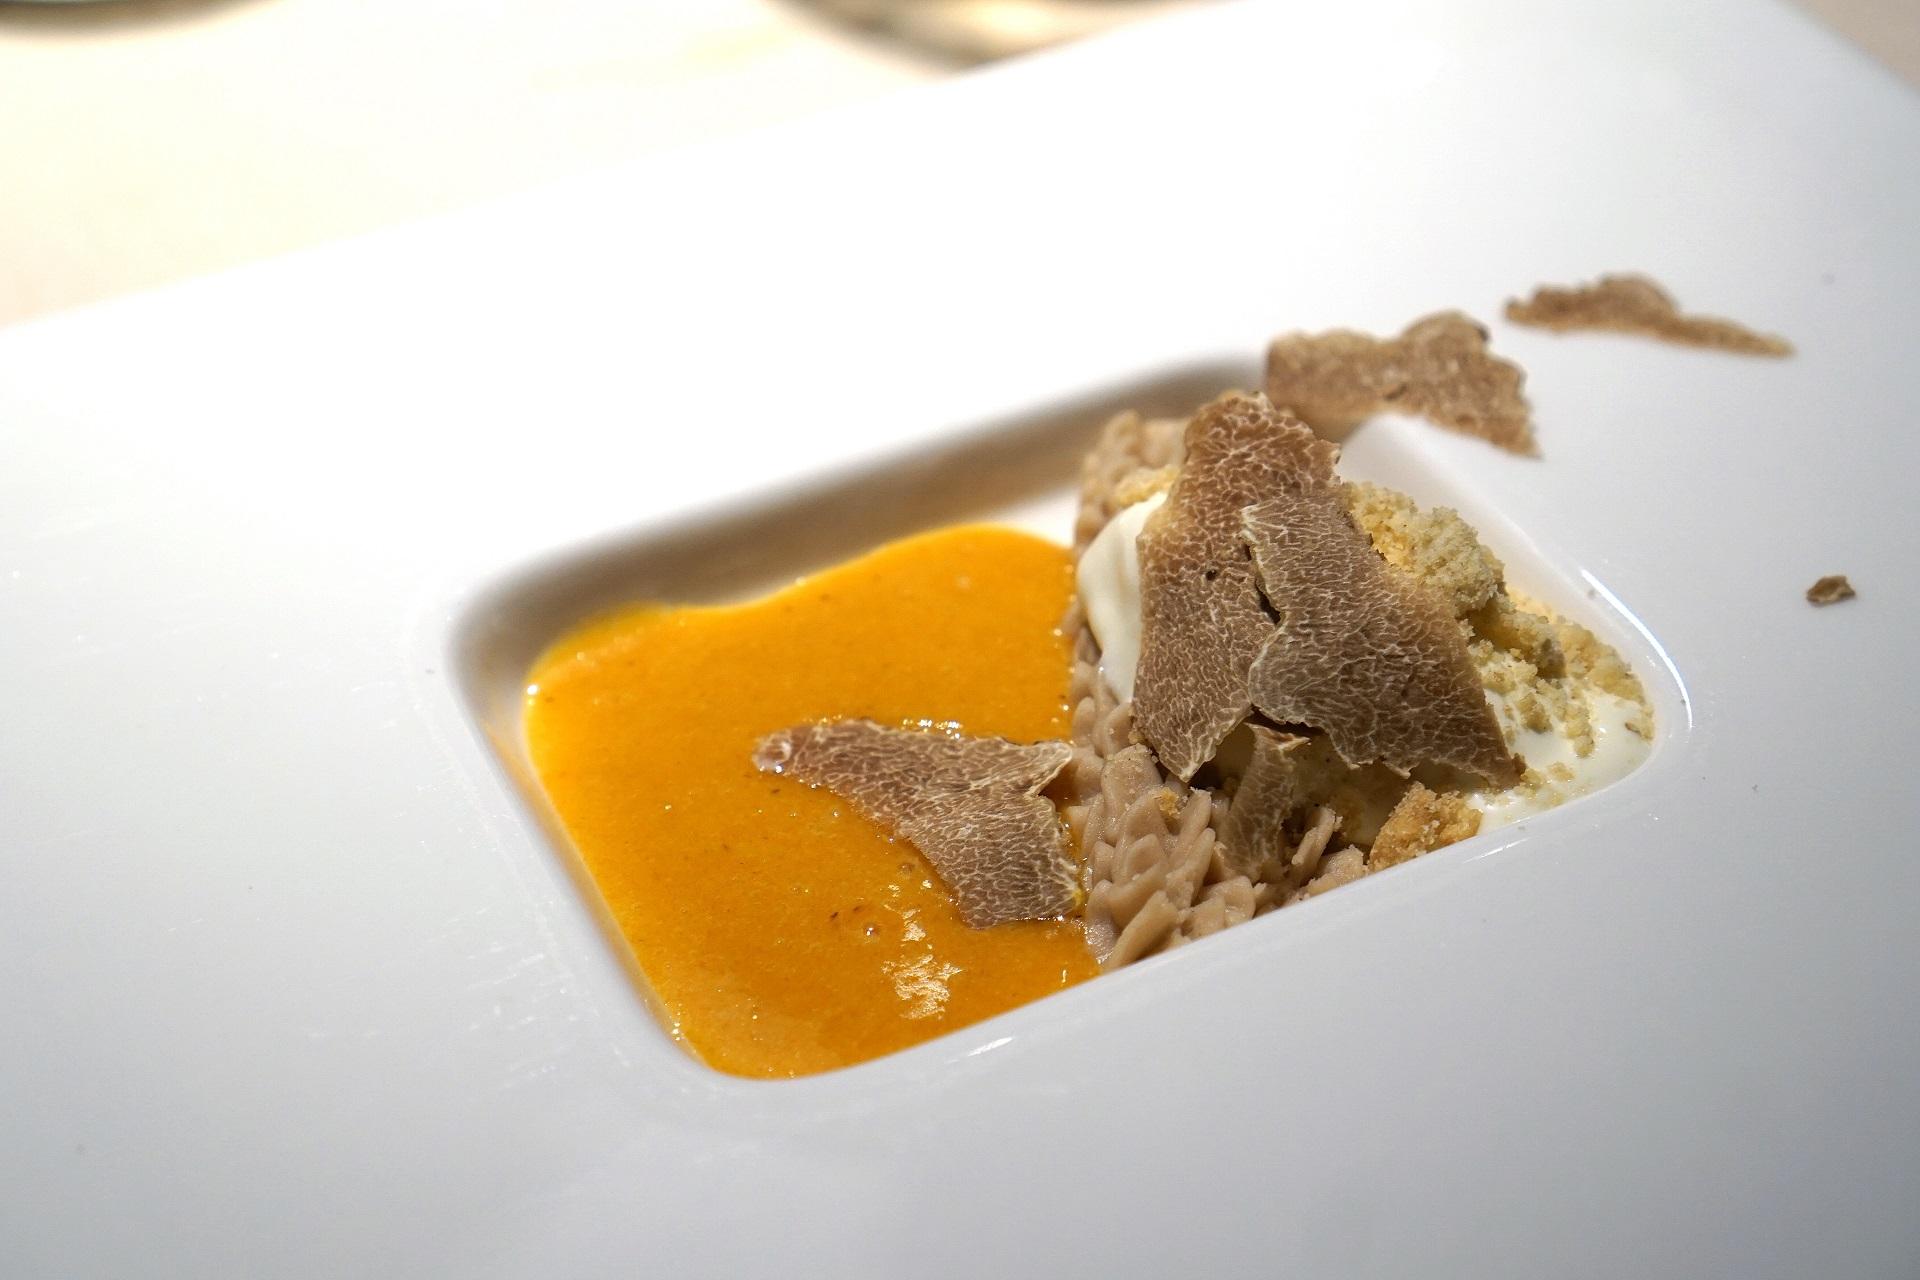 Peca, Portinari, tartufo